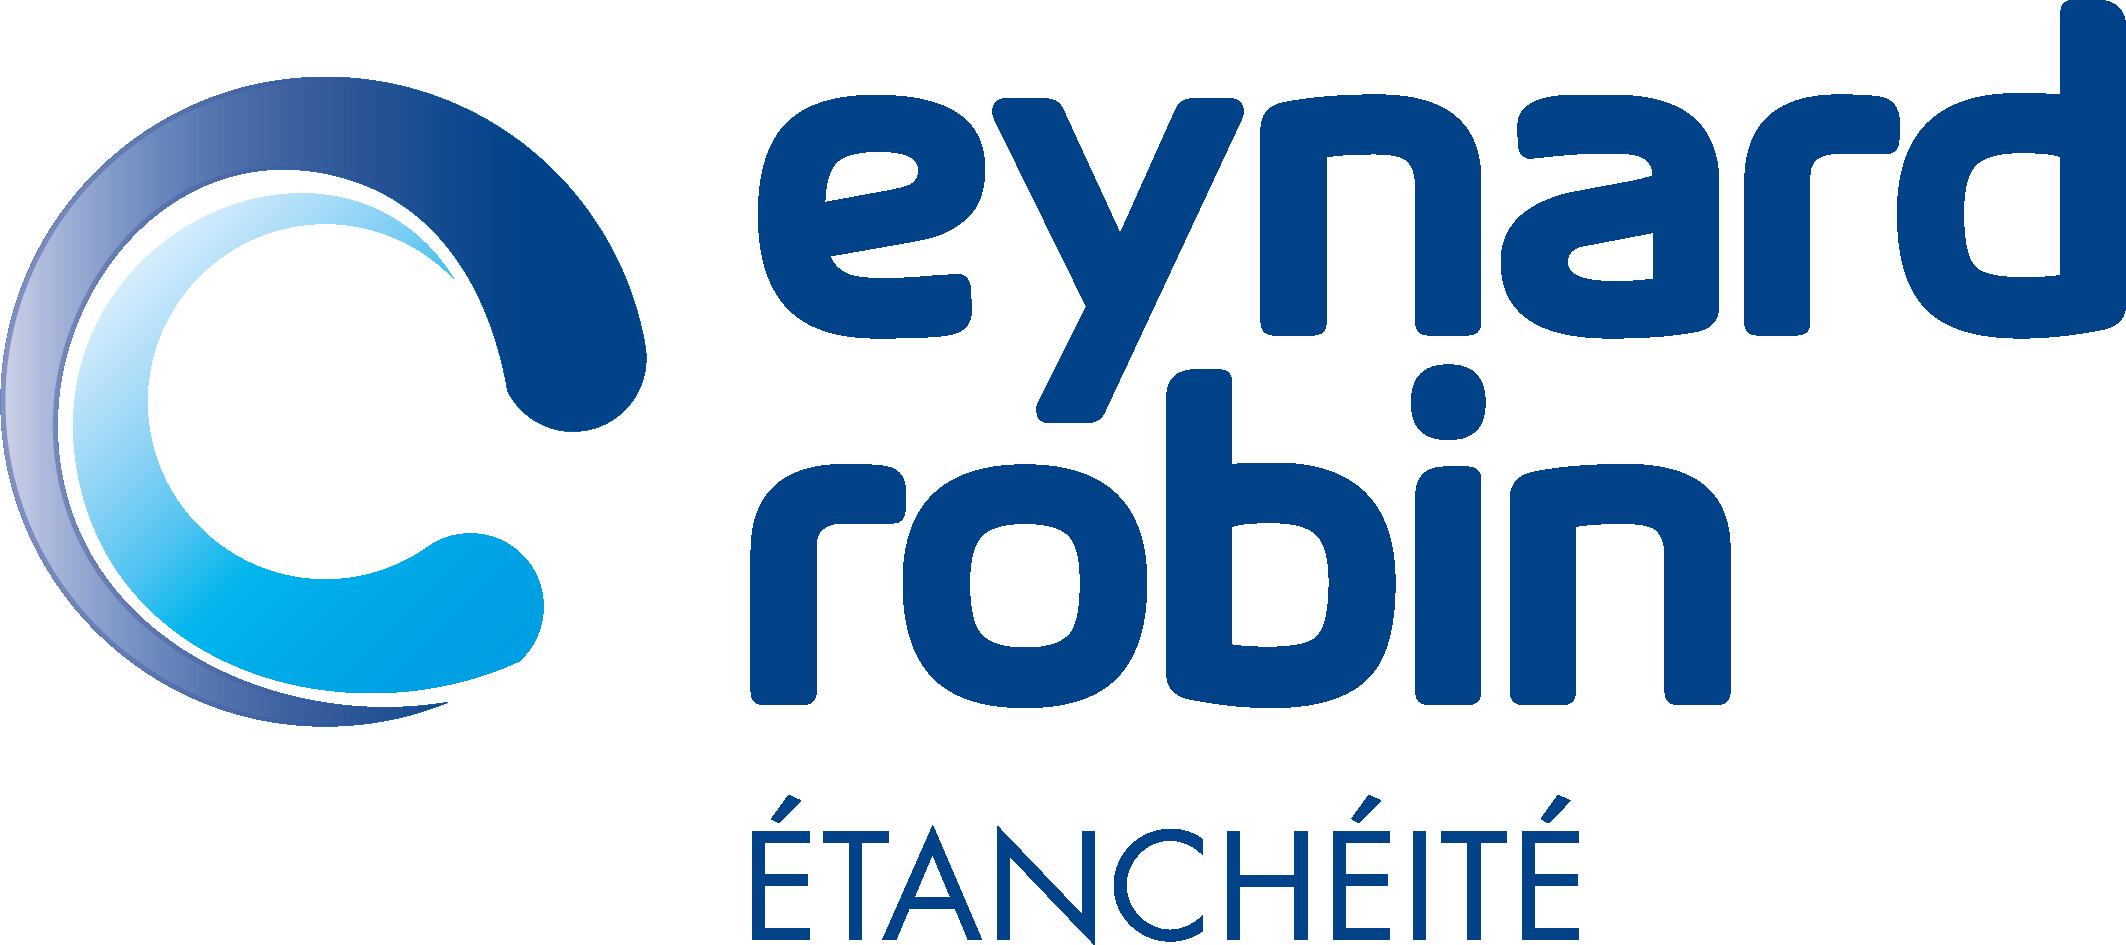 1568877691-eynard-robin-etancheite.png